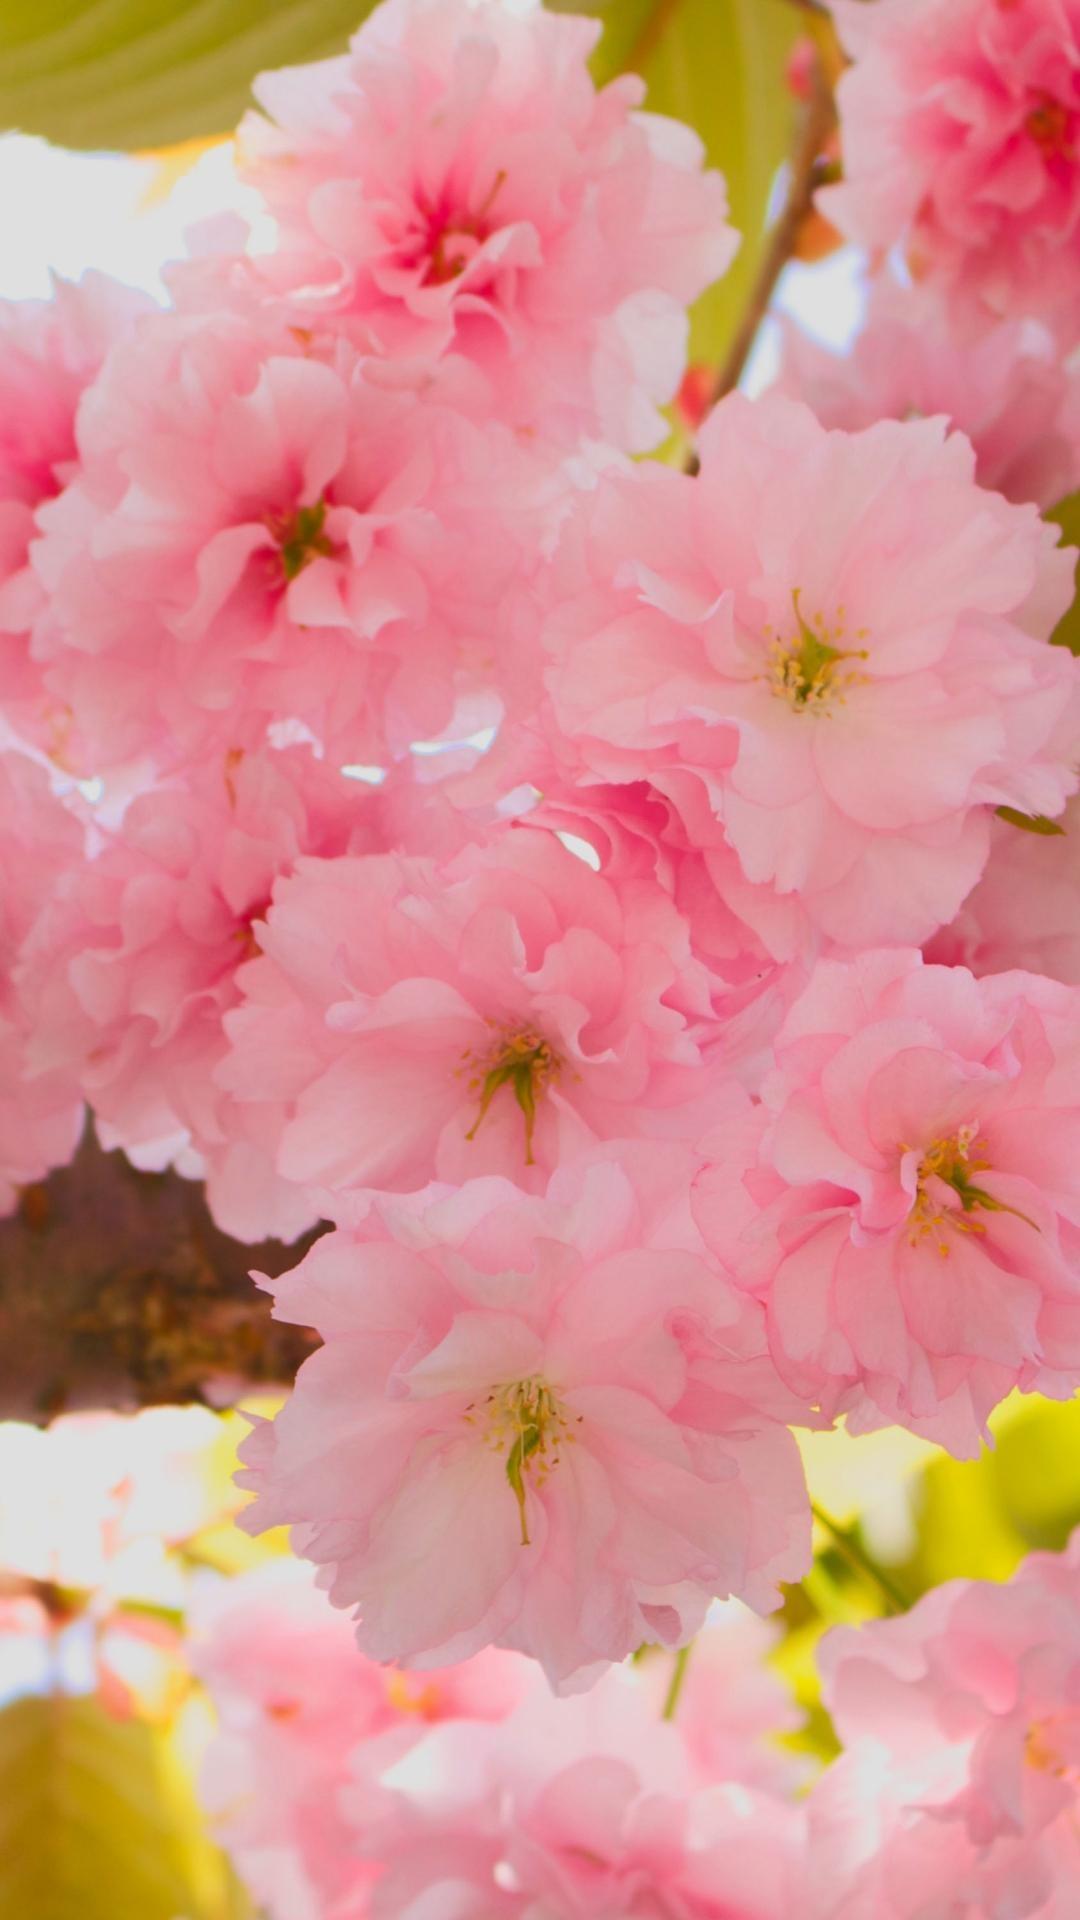 wallpaper.wiki-Cherry-Blossom-iPhone-HD-Wallpaper-PIC-